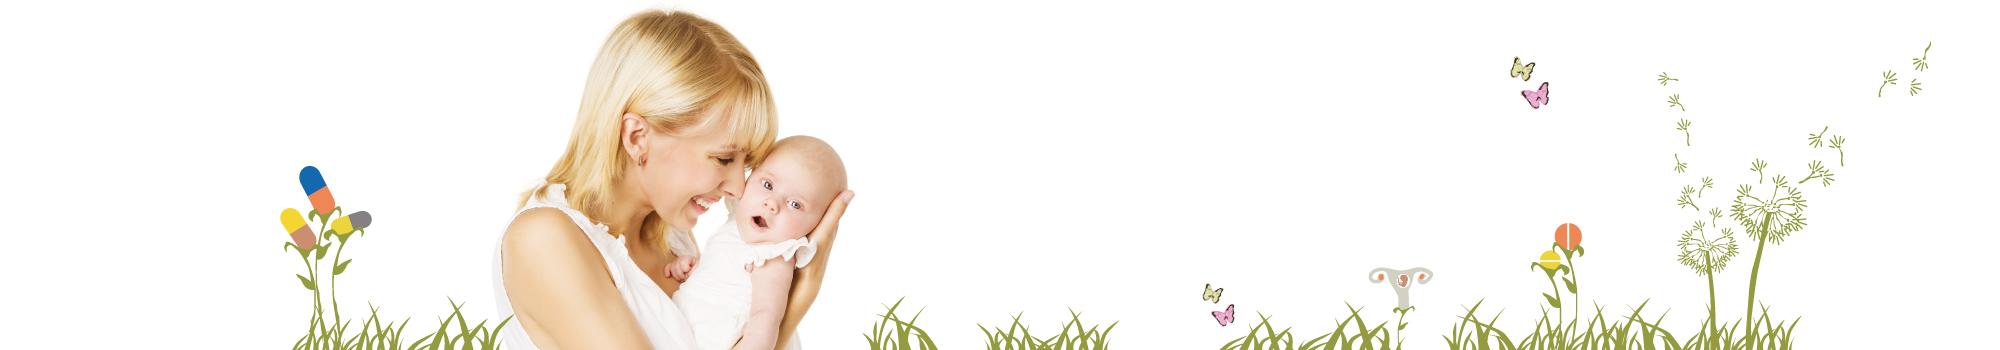 slider-gravidanza